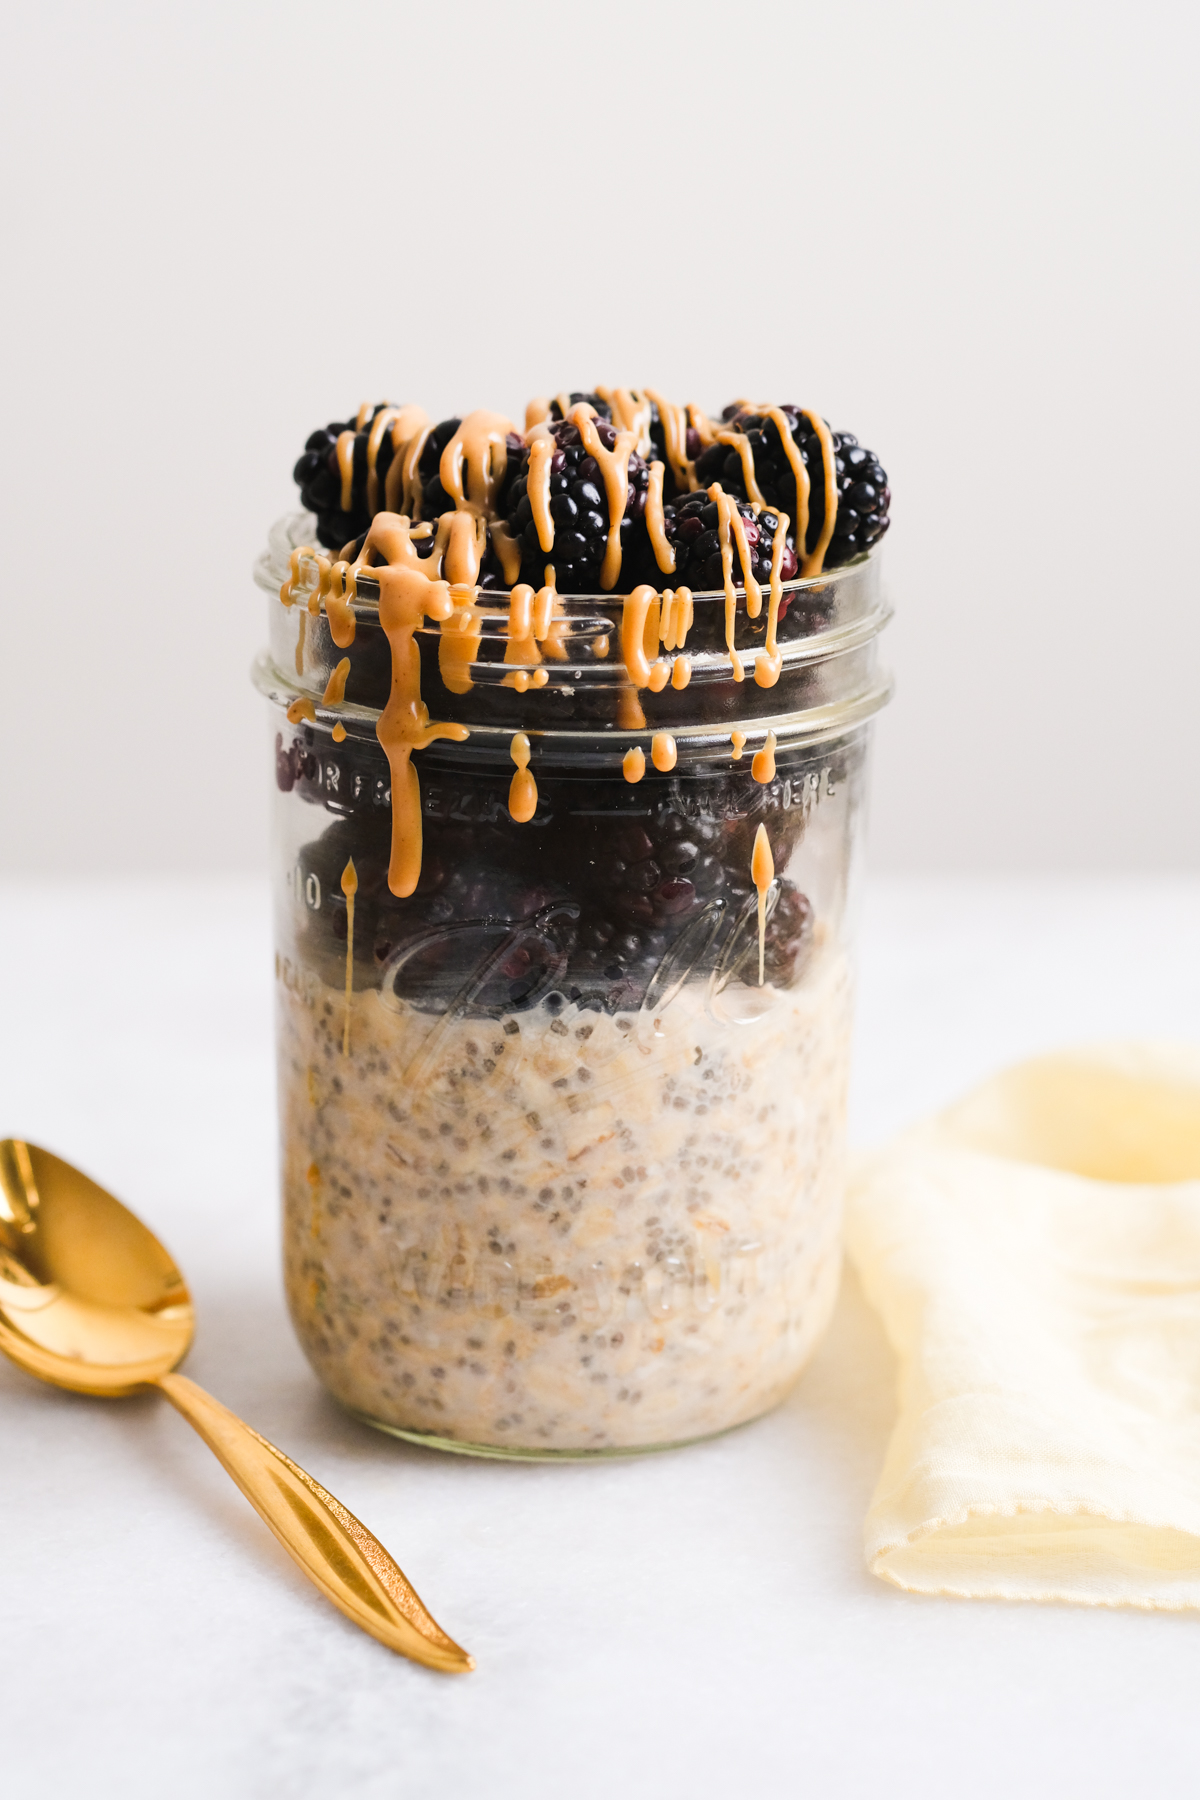 peanut butter overnight oats with fresh blackberries